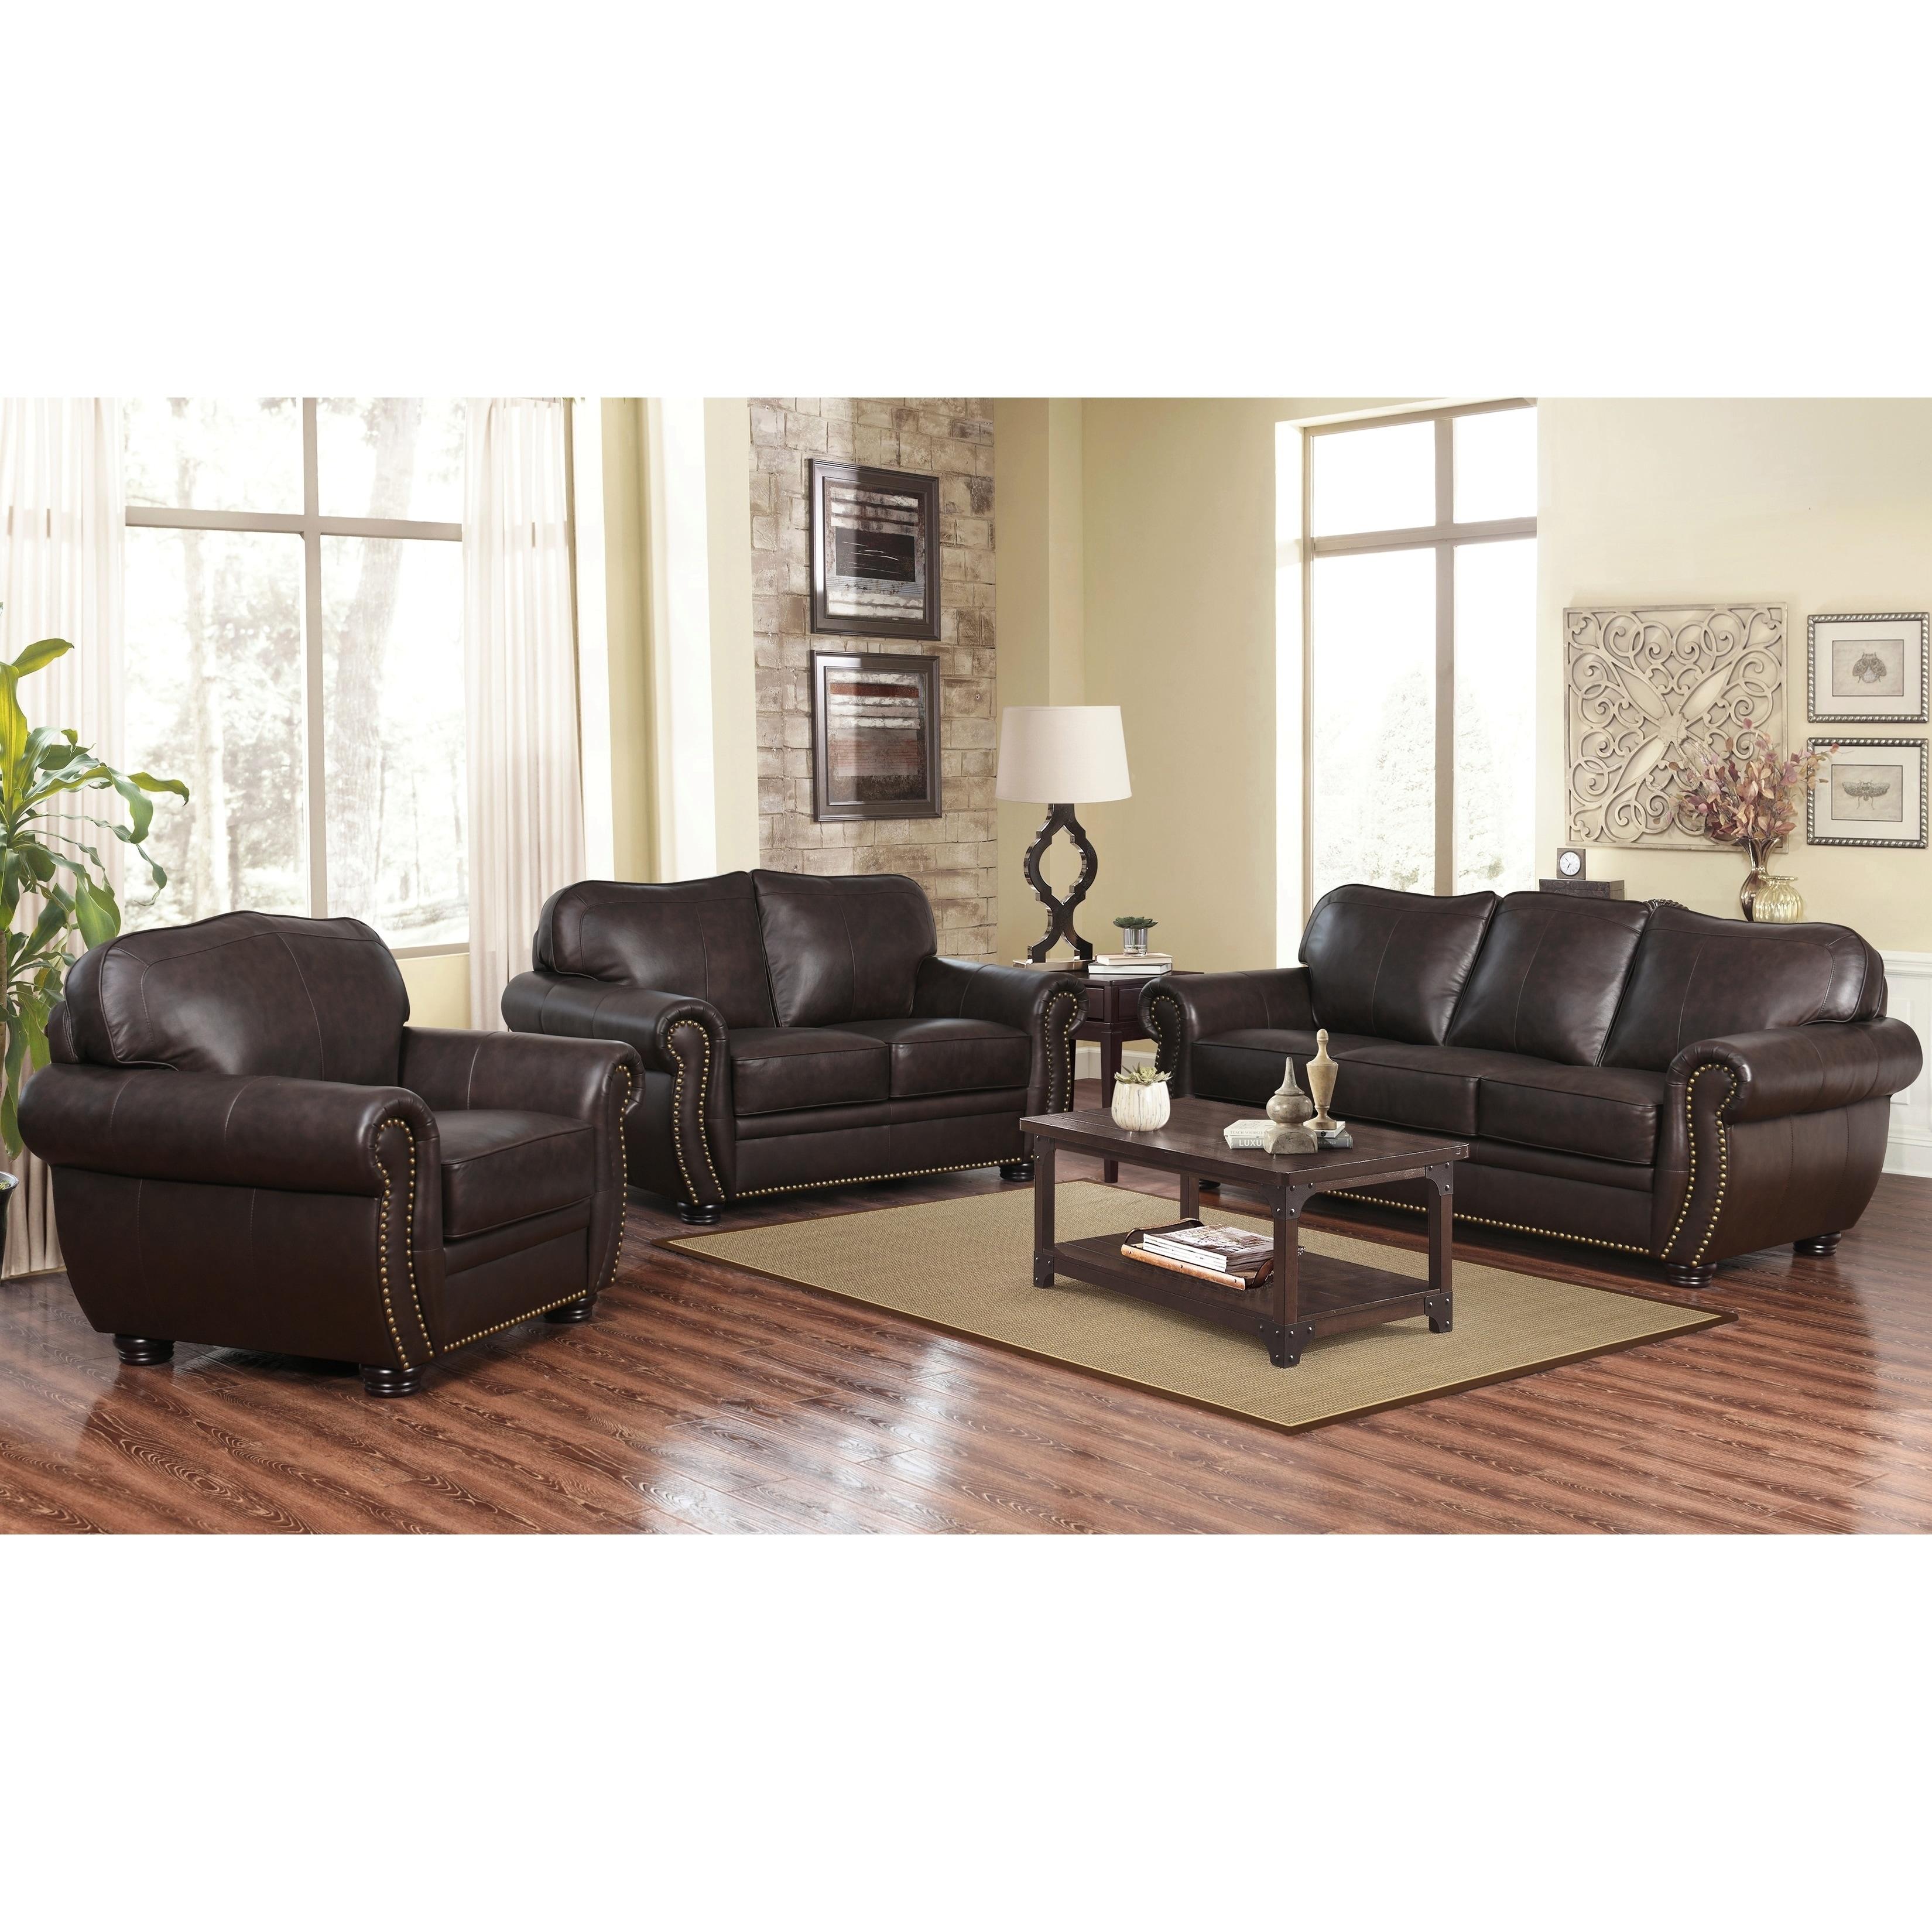 Terrific Abbyson Richfield Brown Top Grain Leather 3 Piece Living Room Sofa Set Ibusinesslaw Wood Chair Design Ideas Ibusinesslaworg